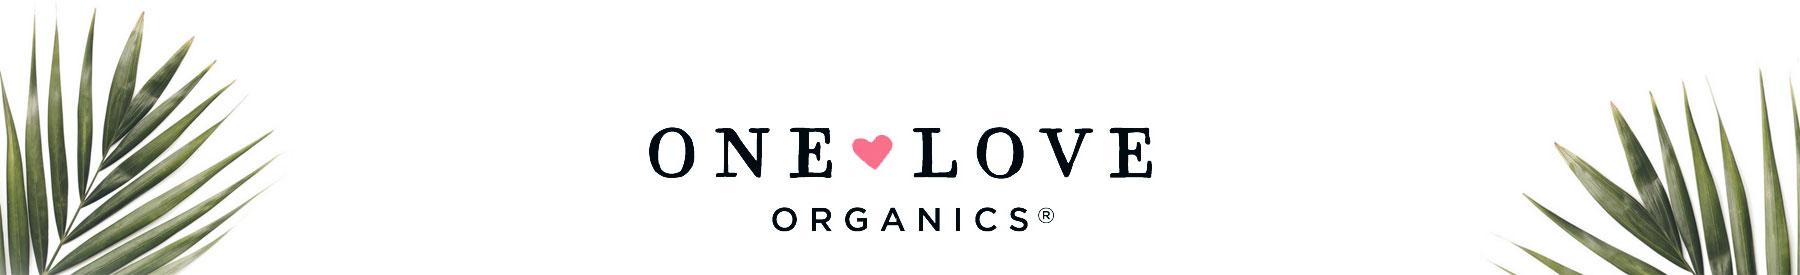 HAUS Salon Shop One Love Organics